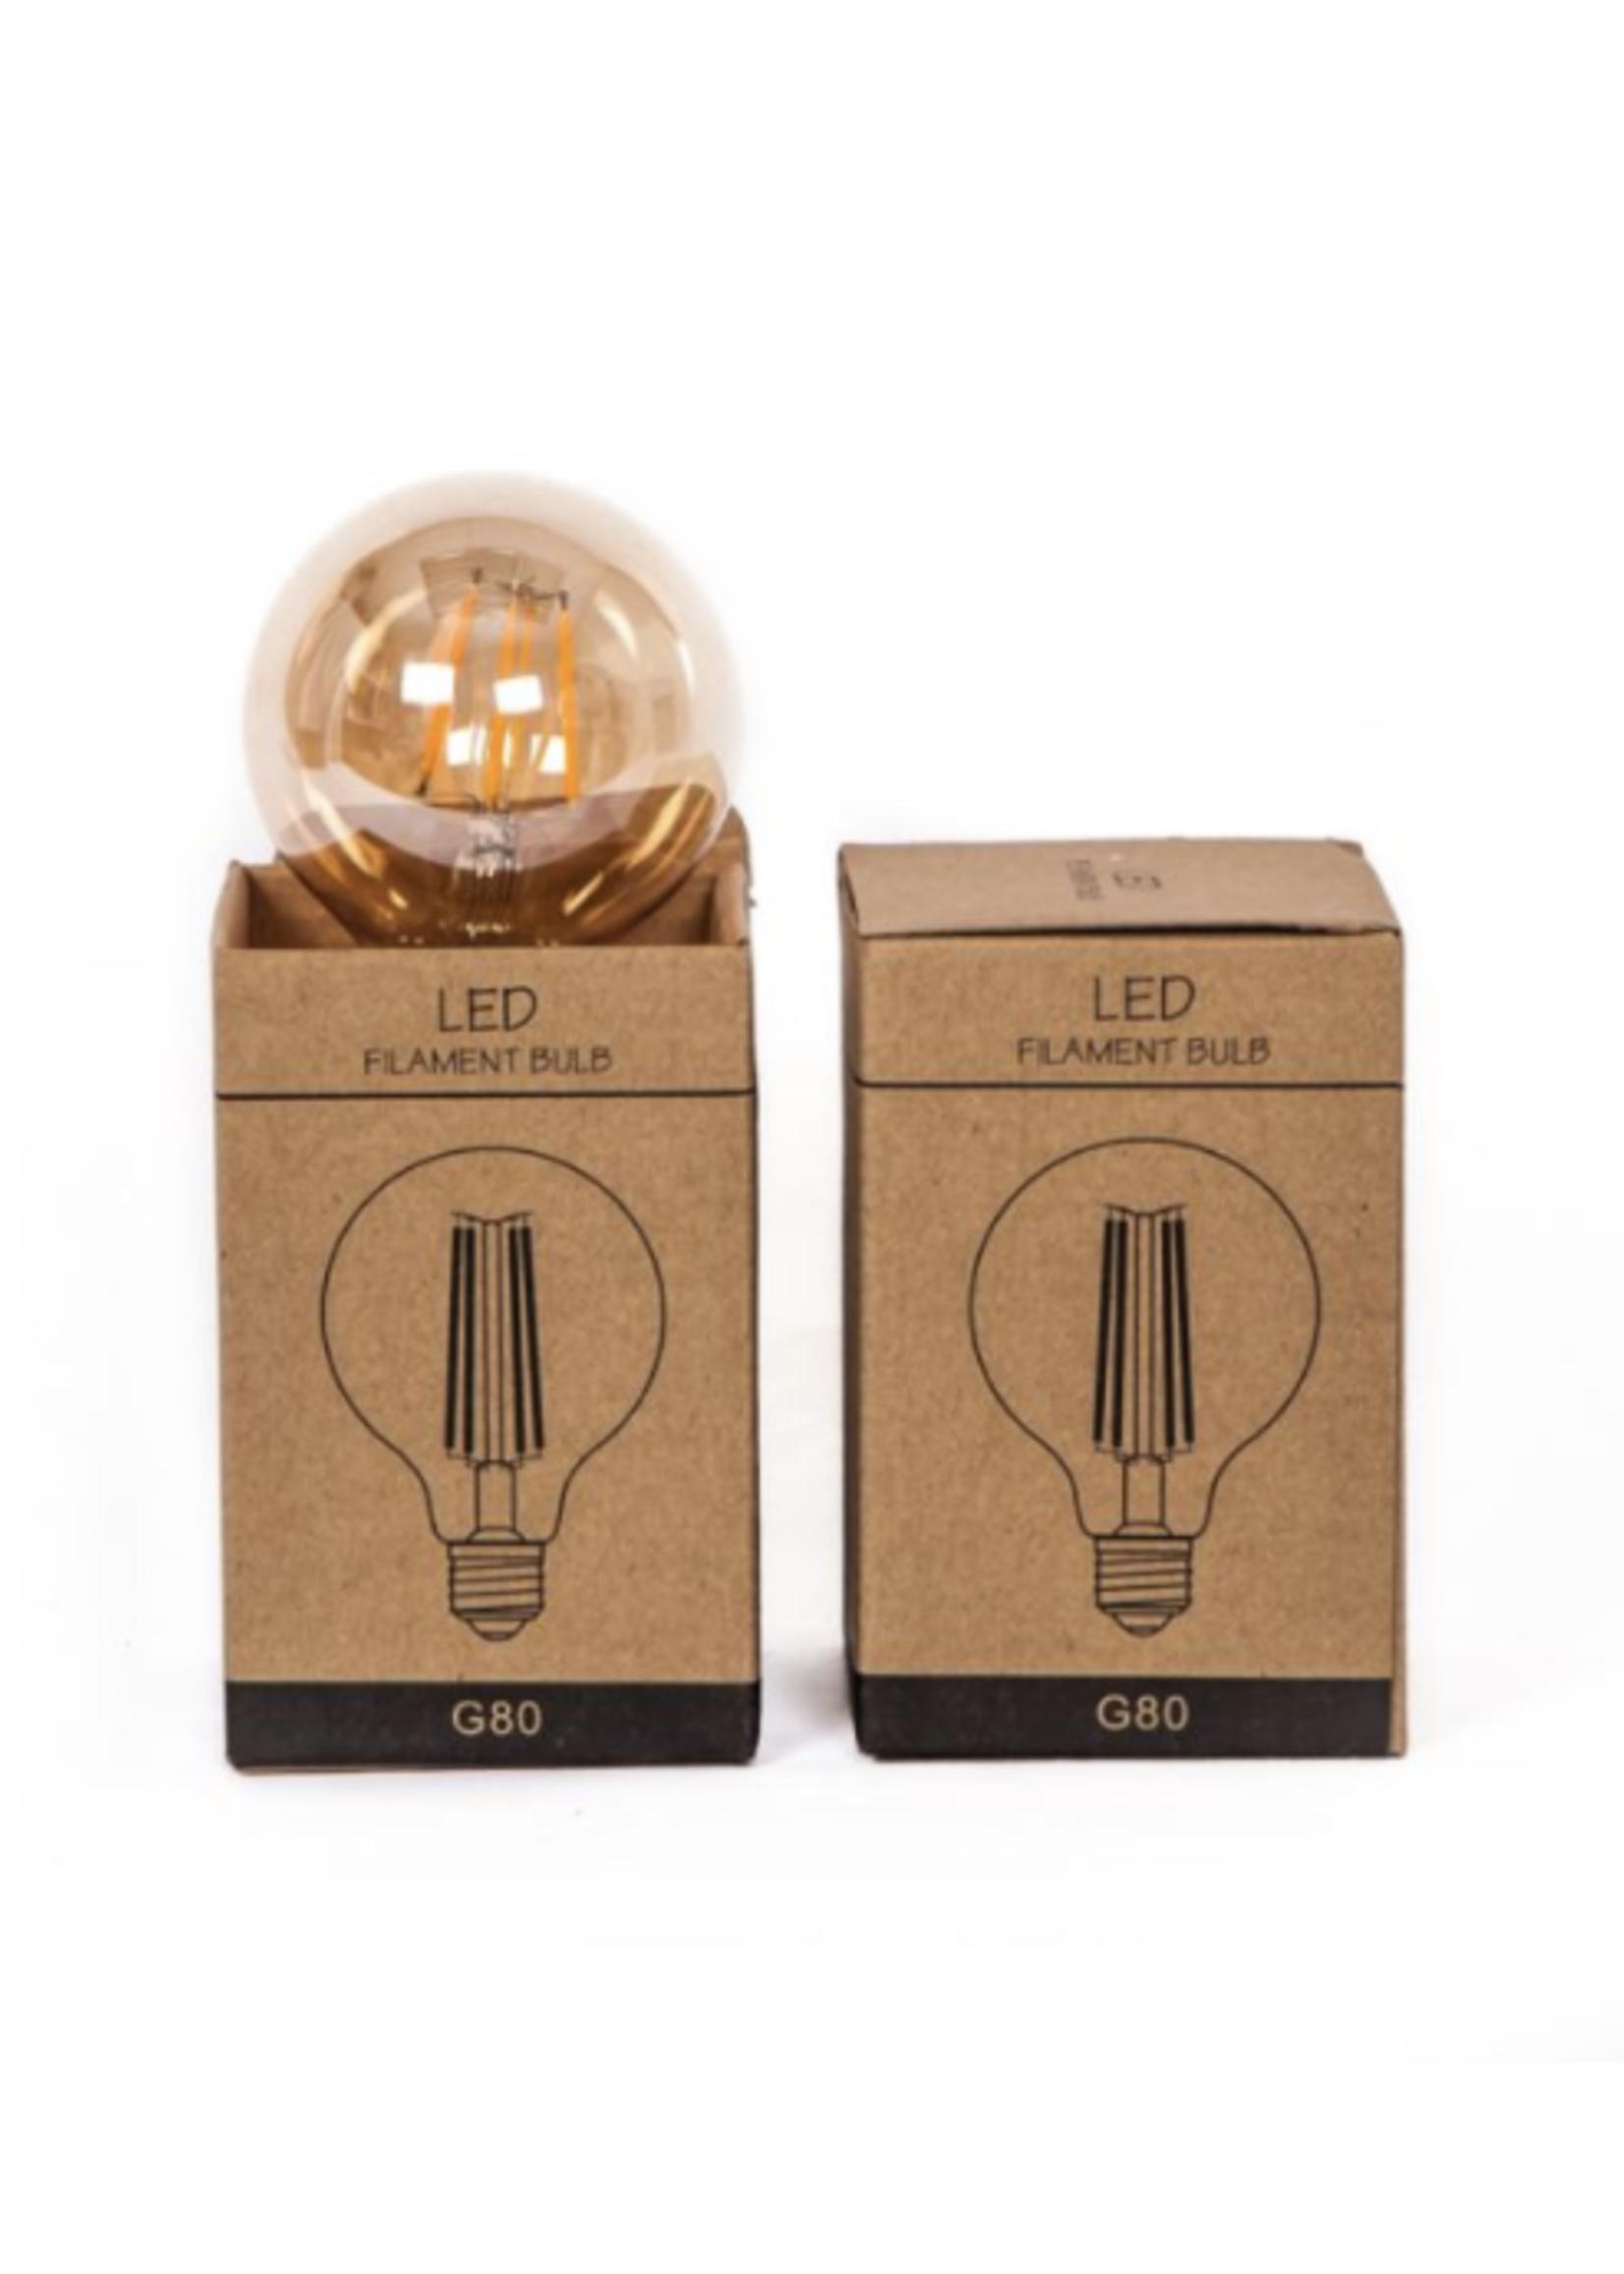 LED-lamp 2W rond model 8,5x8,5x13cm 160LUM 2300K